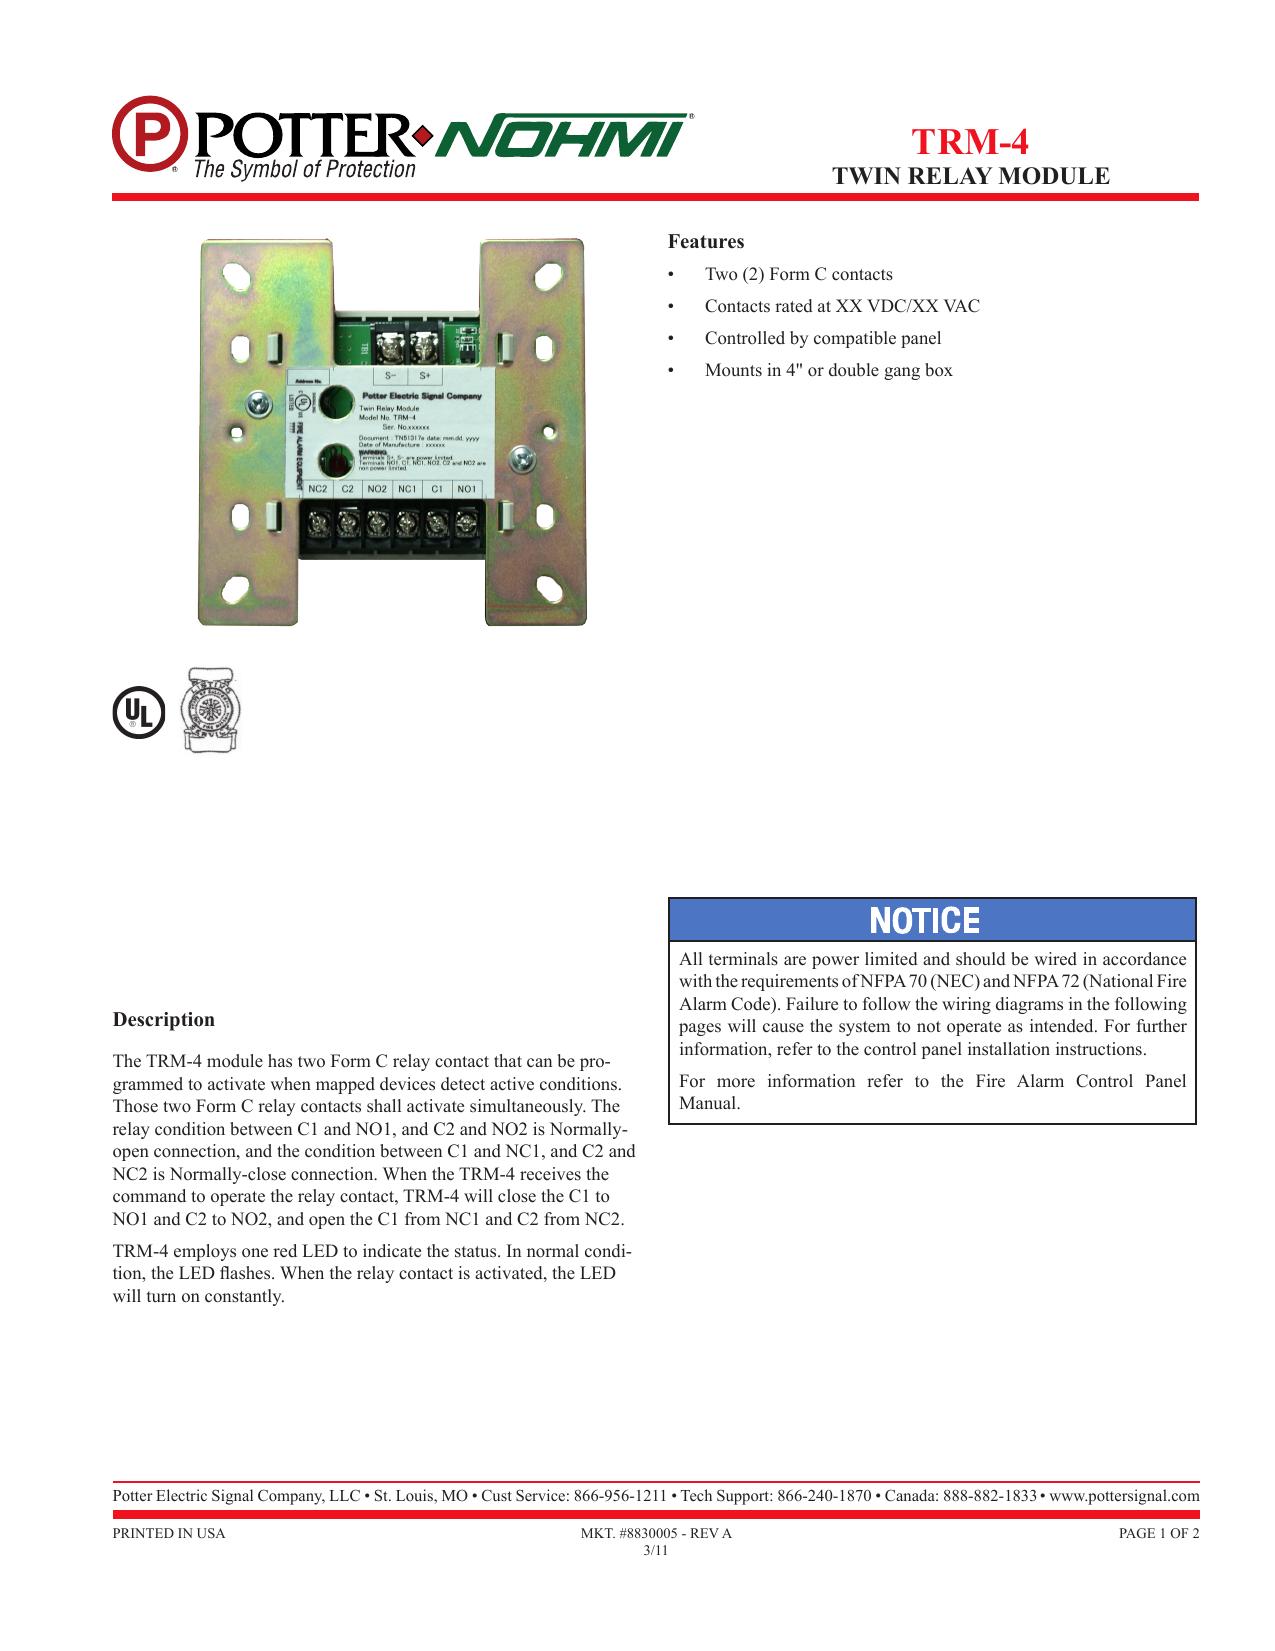 Mkt Wiring Diagram - List of Wiring Diagrams on